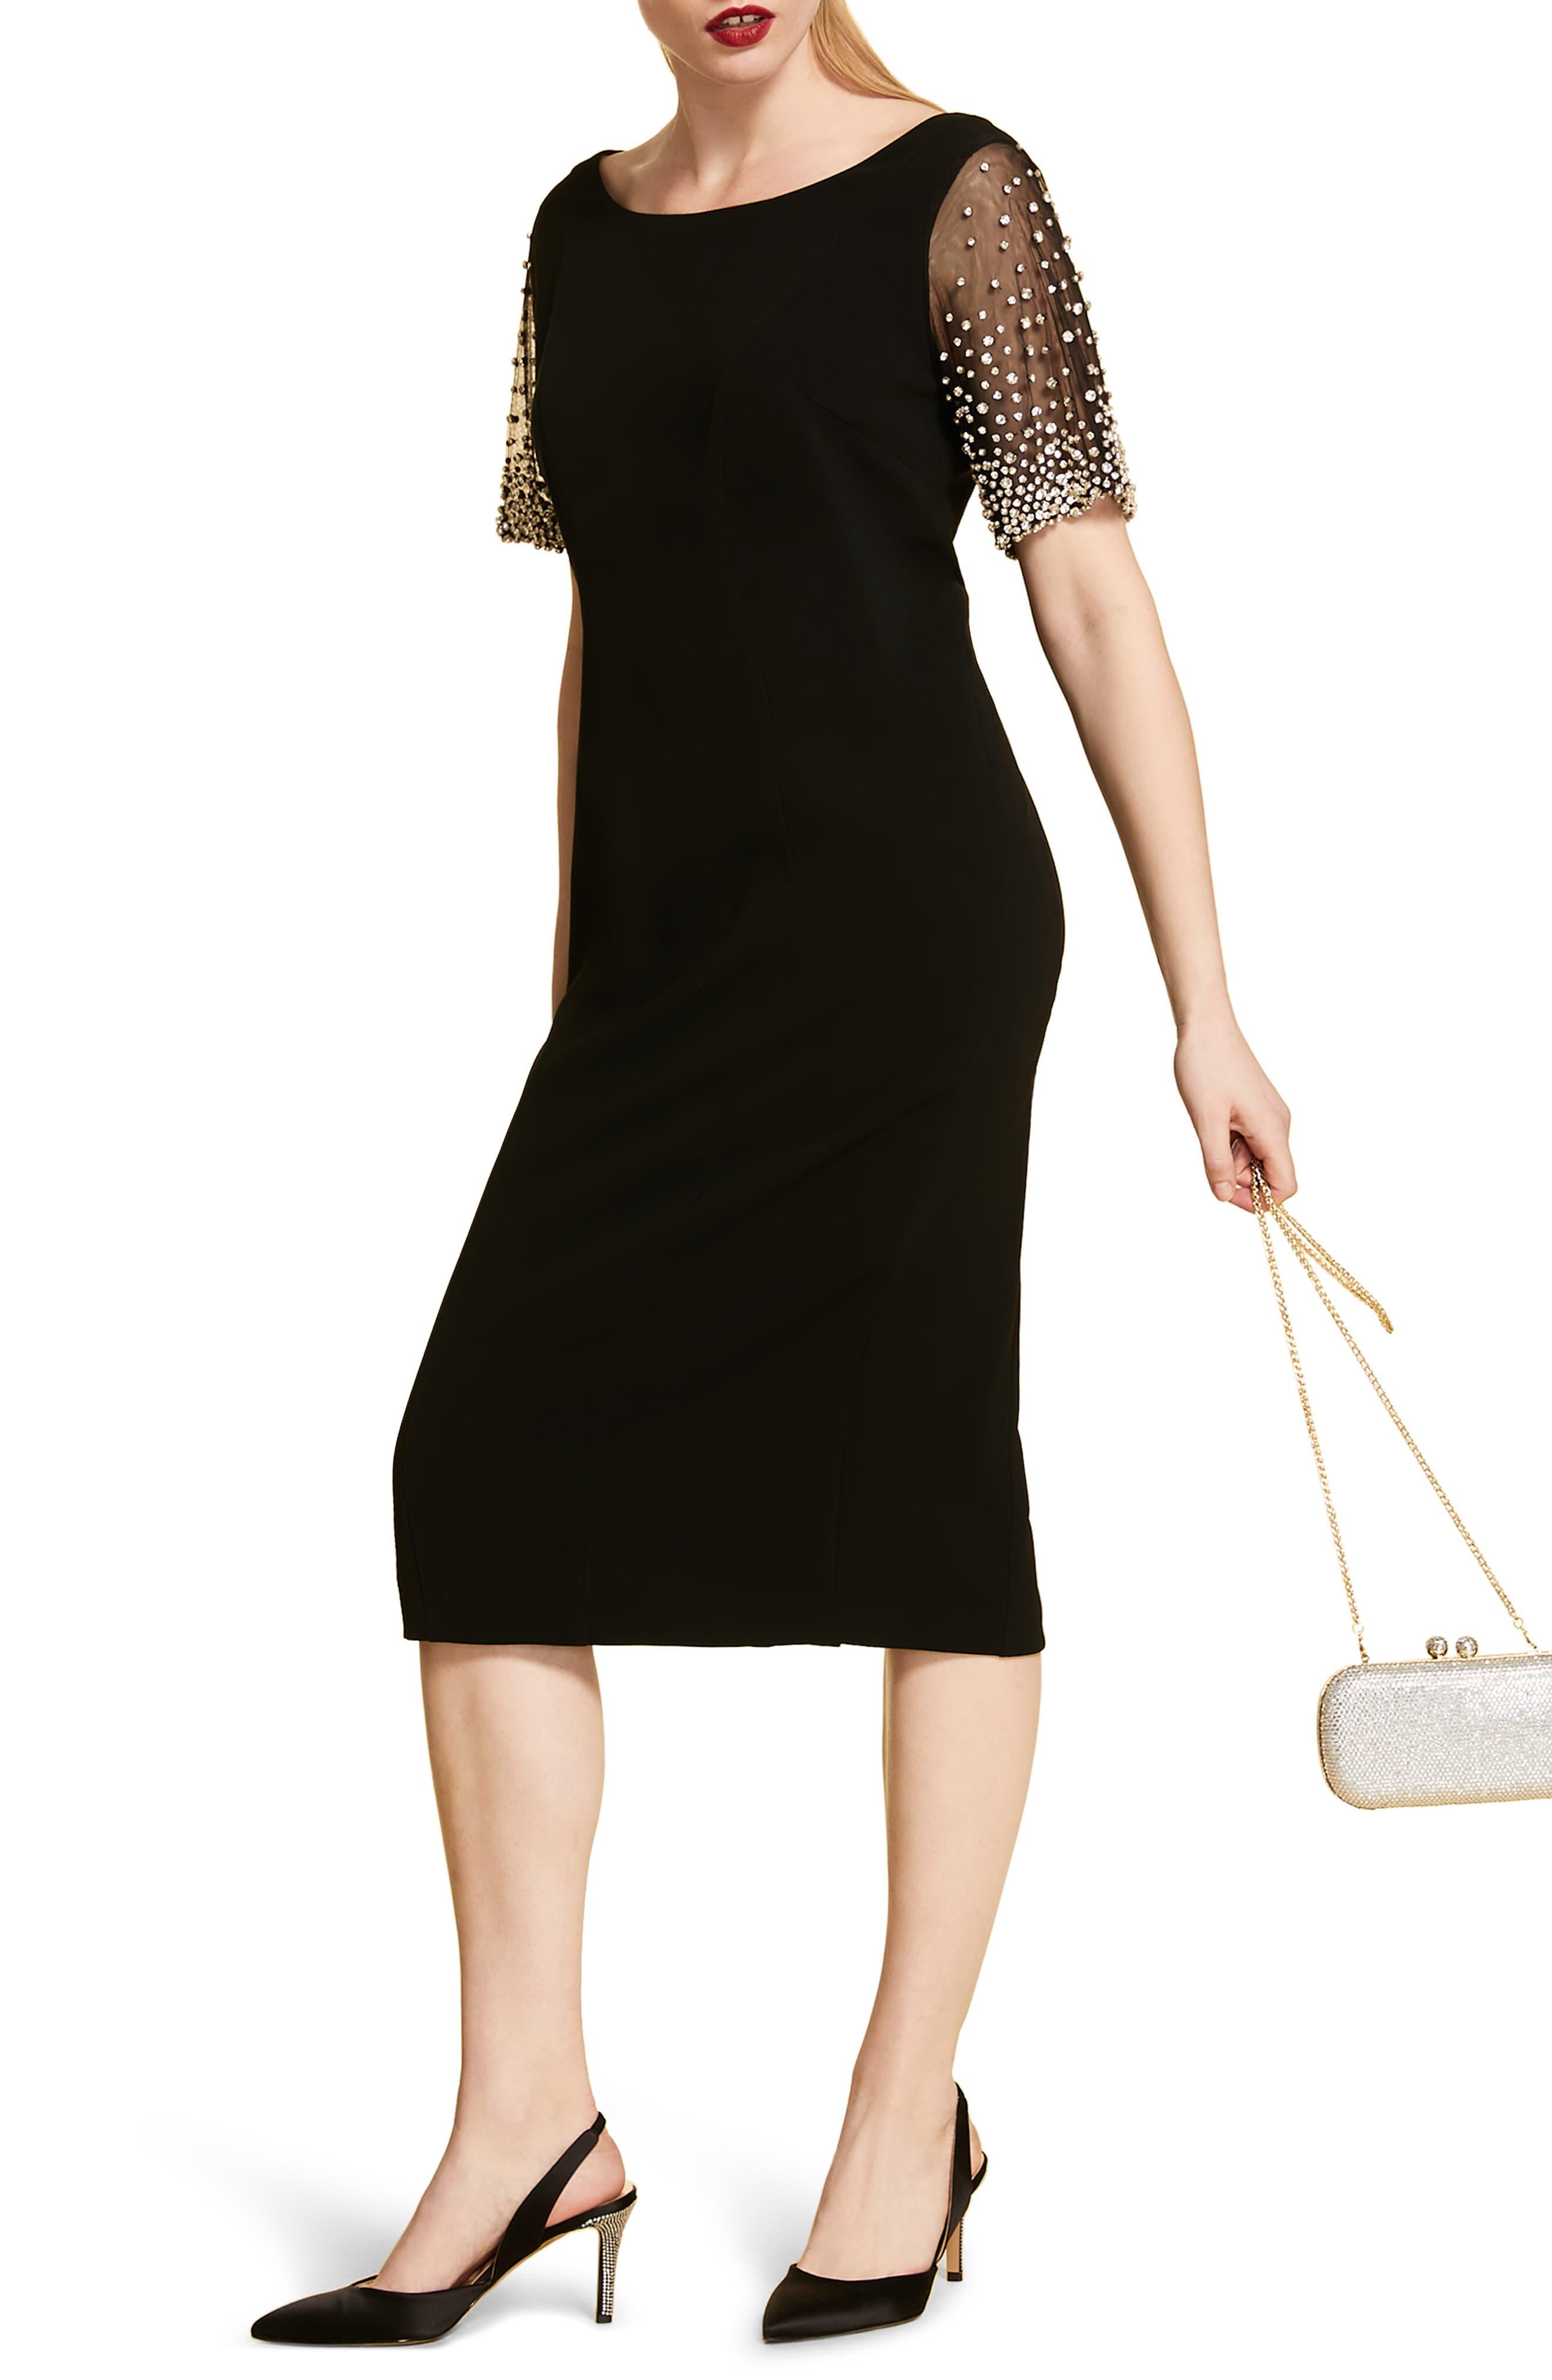 Plus Size Marina Rinaldi Ducato Jewel Sleeve Cocktail Dress, Black